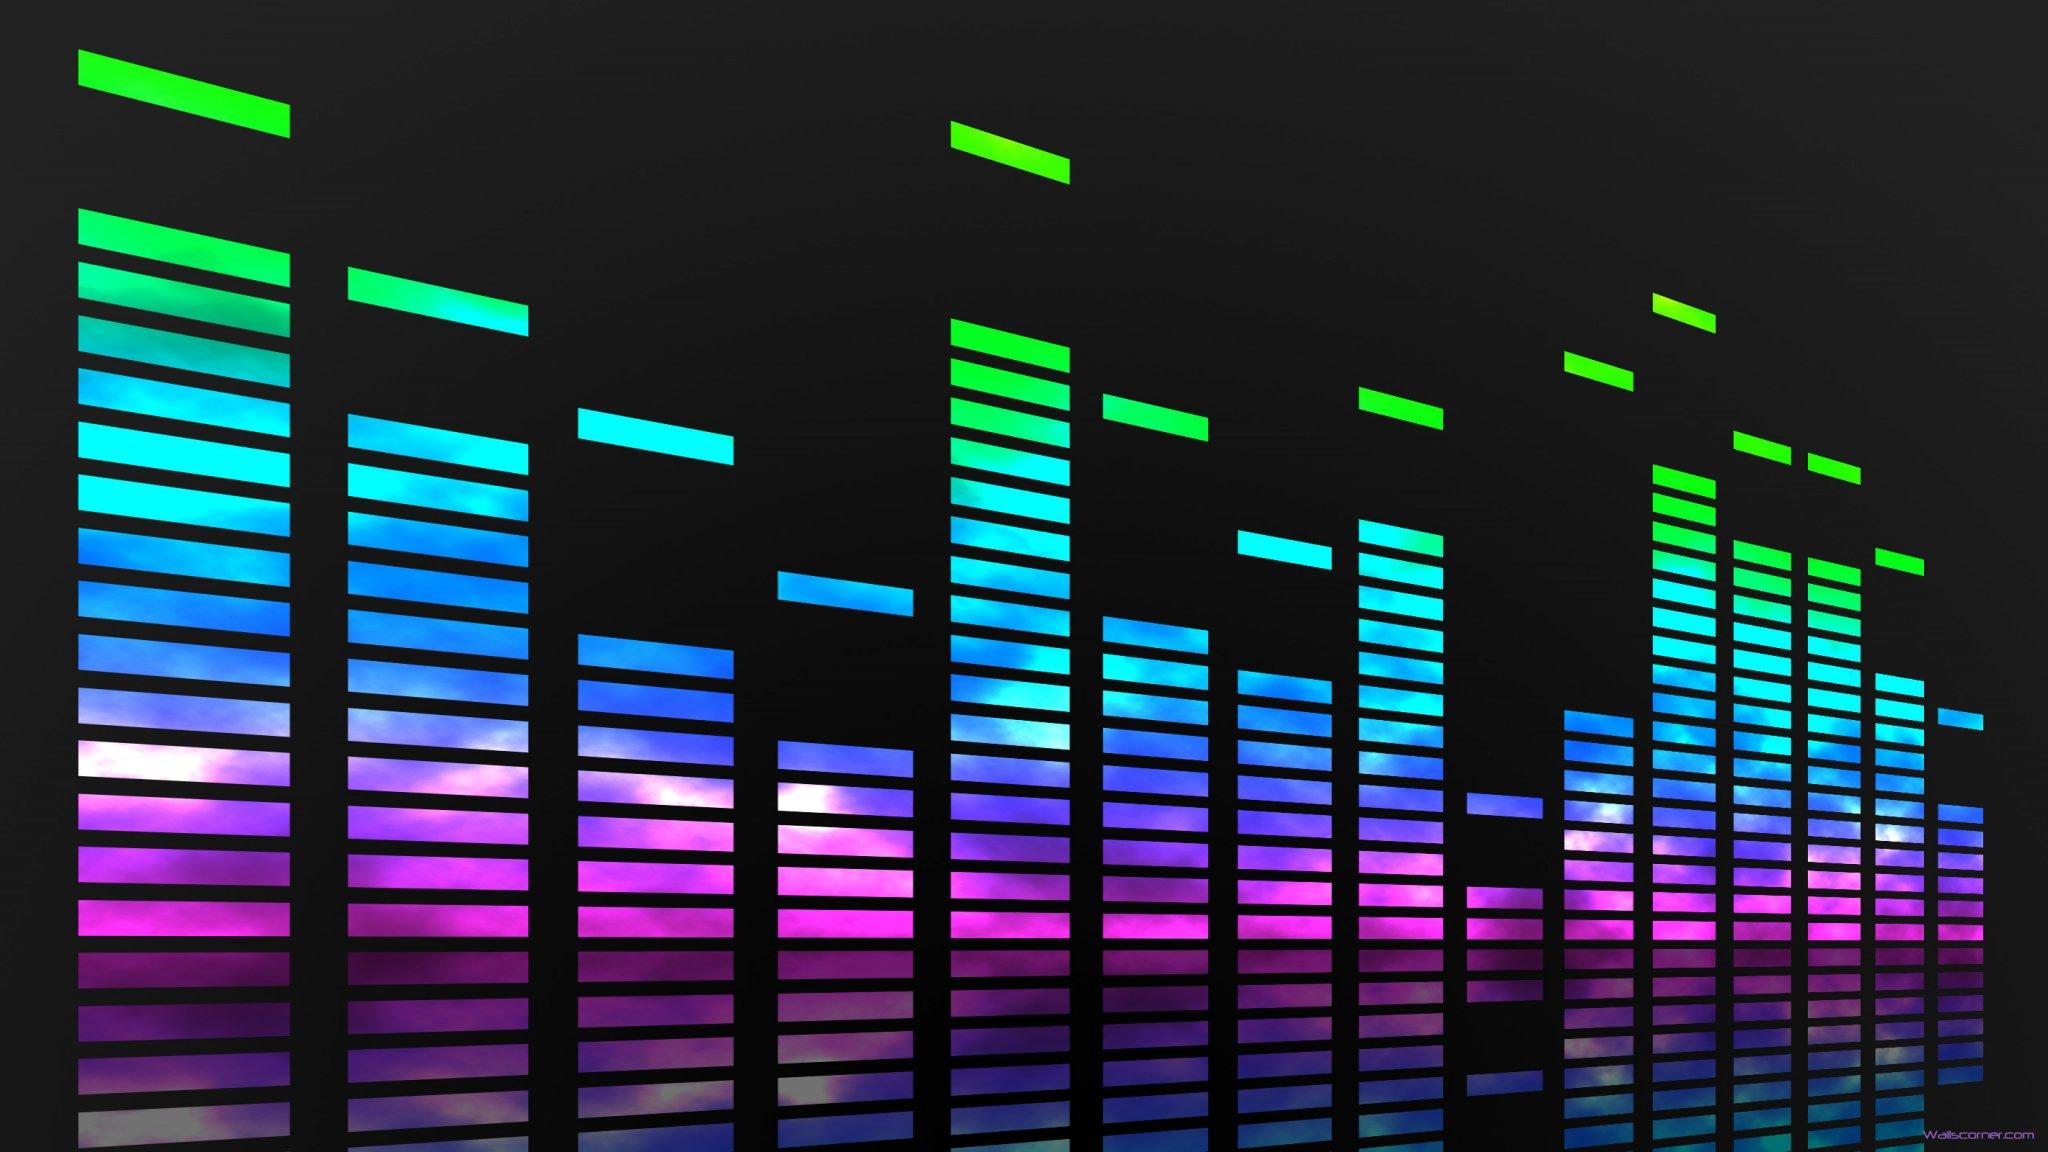 wallpaper wallpaper hd 720p resolution 1280x720 wallpaper hd 1080p 2048x1152